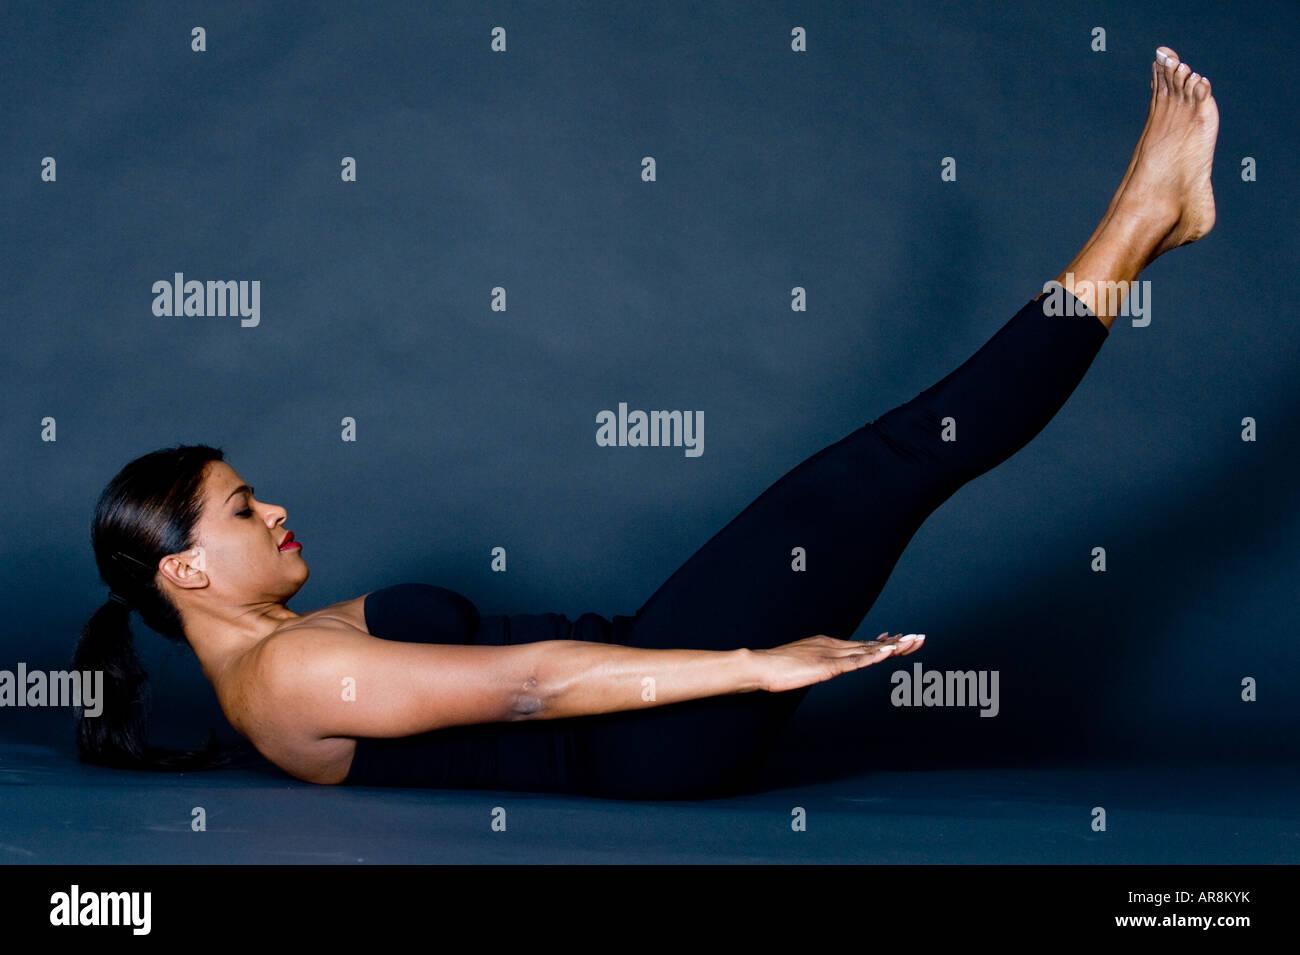 woman excercising pilates - Stock Image